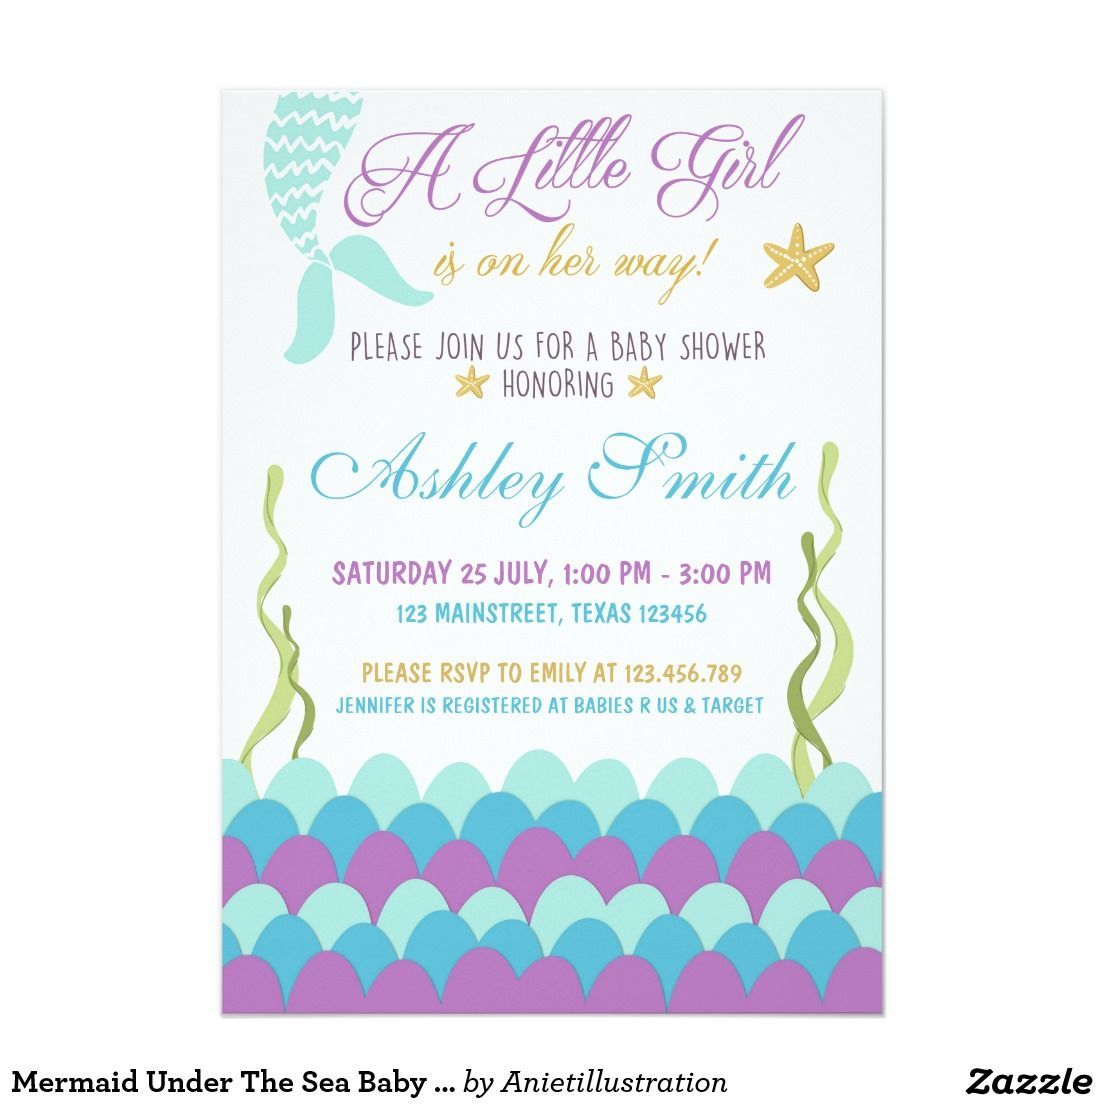 Mermaid Under The Sea Baby Shower Invitation | Shower invitations ...